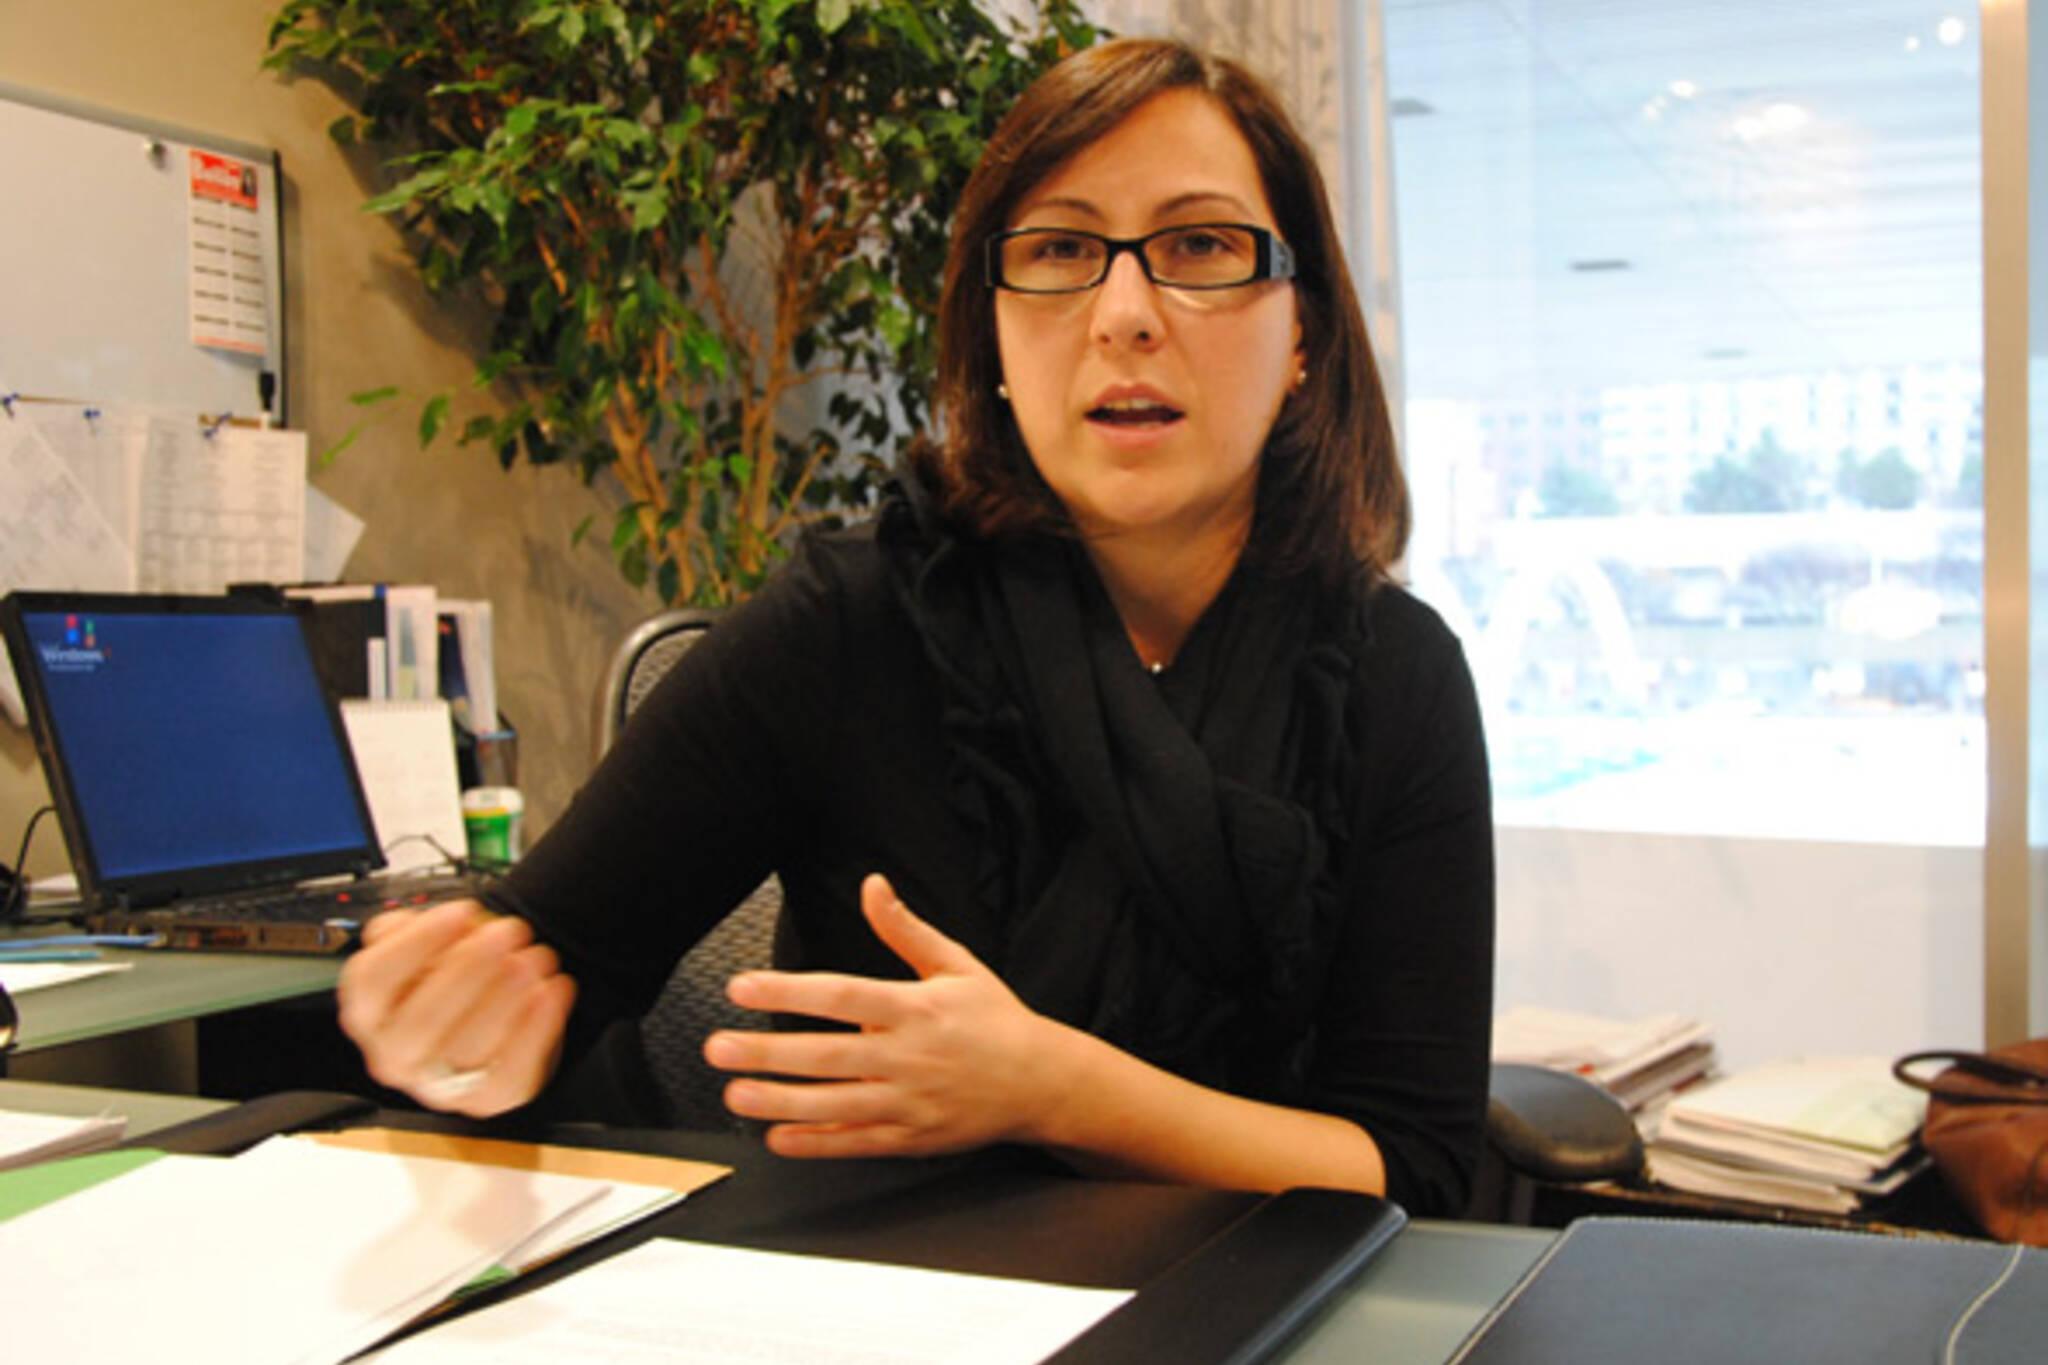 Toronto Ana Bailao